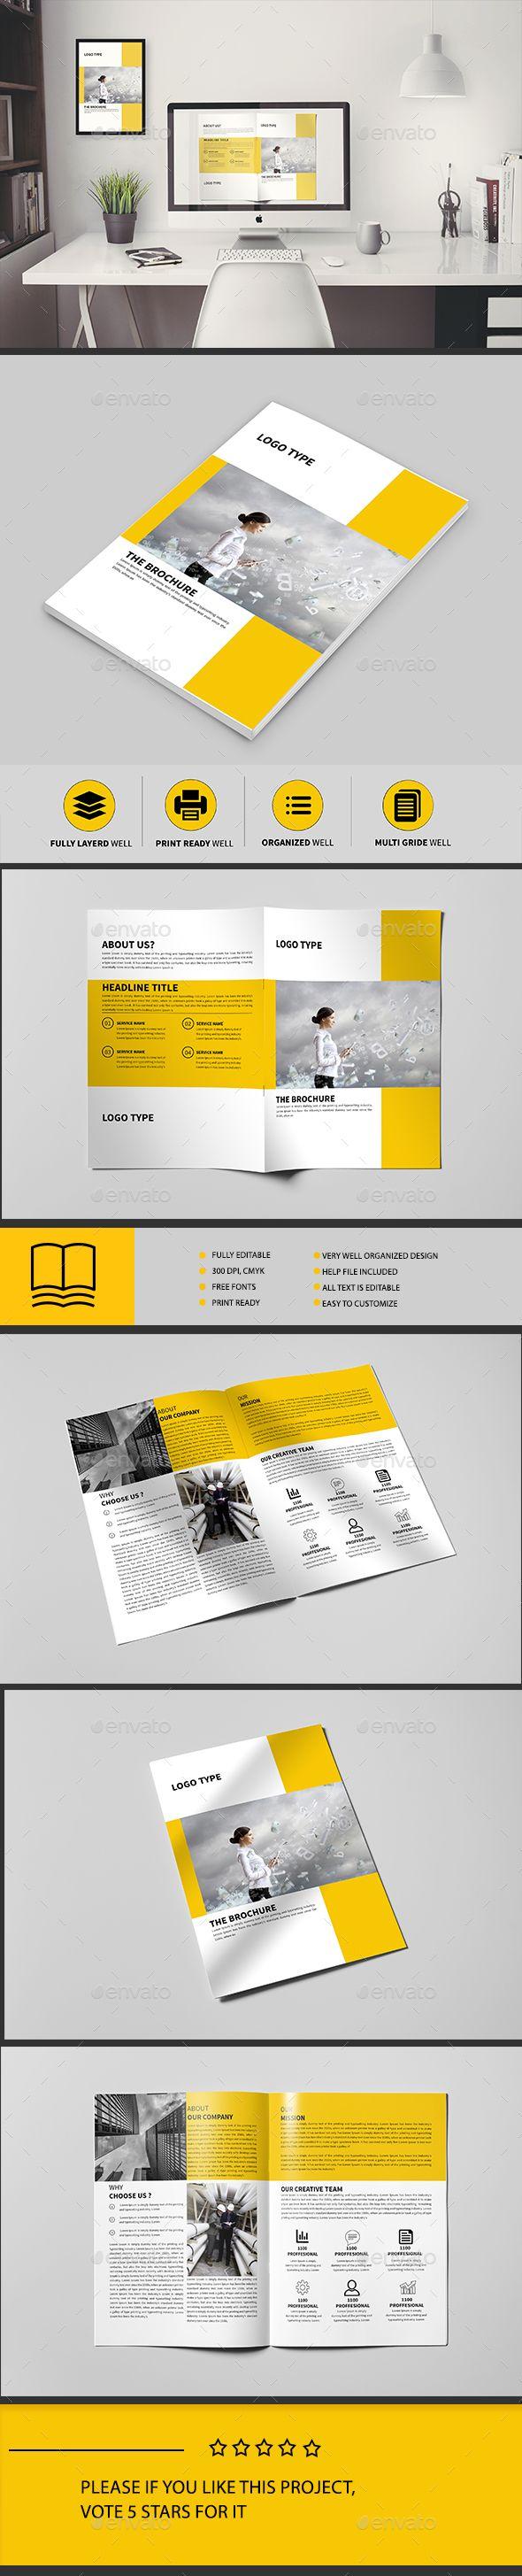 Corporate Bi-Fold Brochure Template InDesign INDD. Download here…